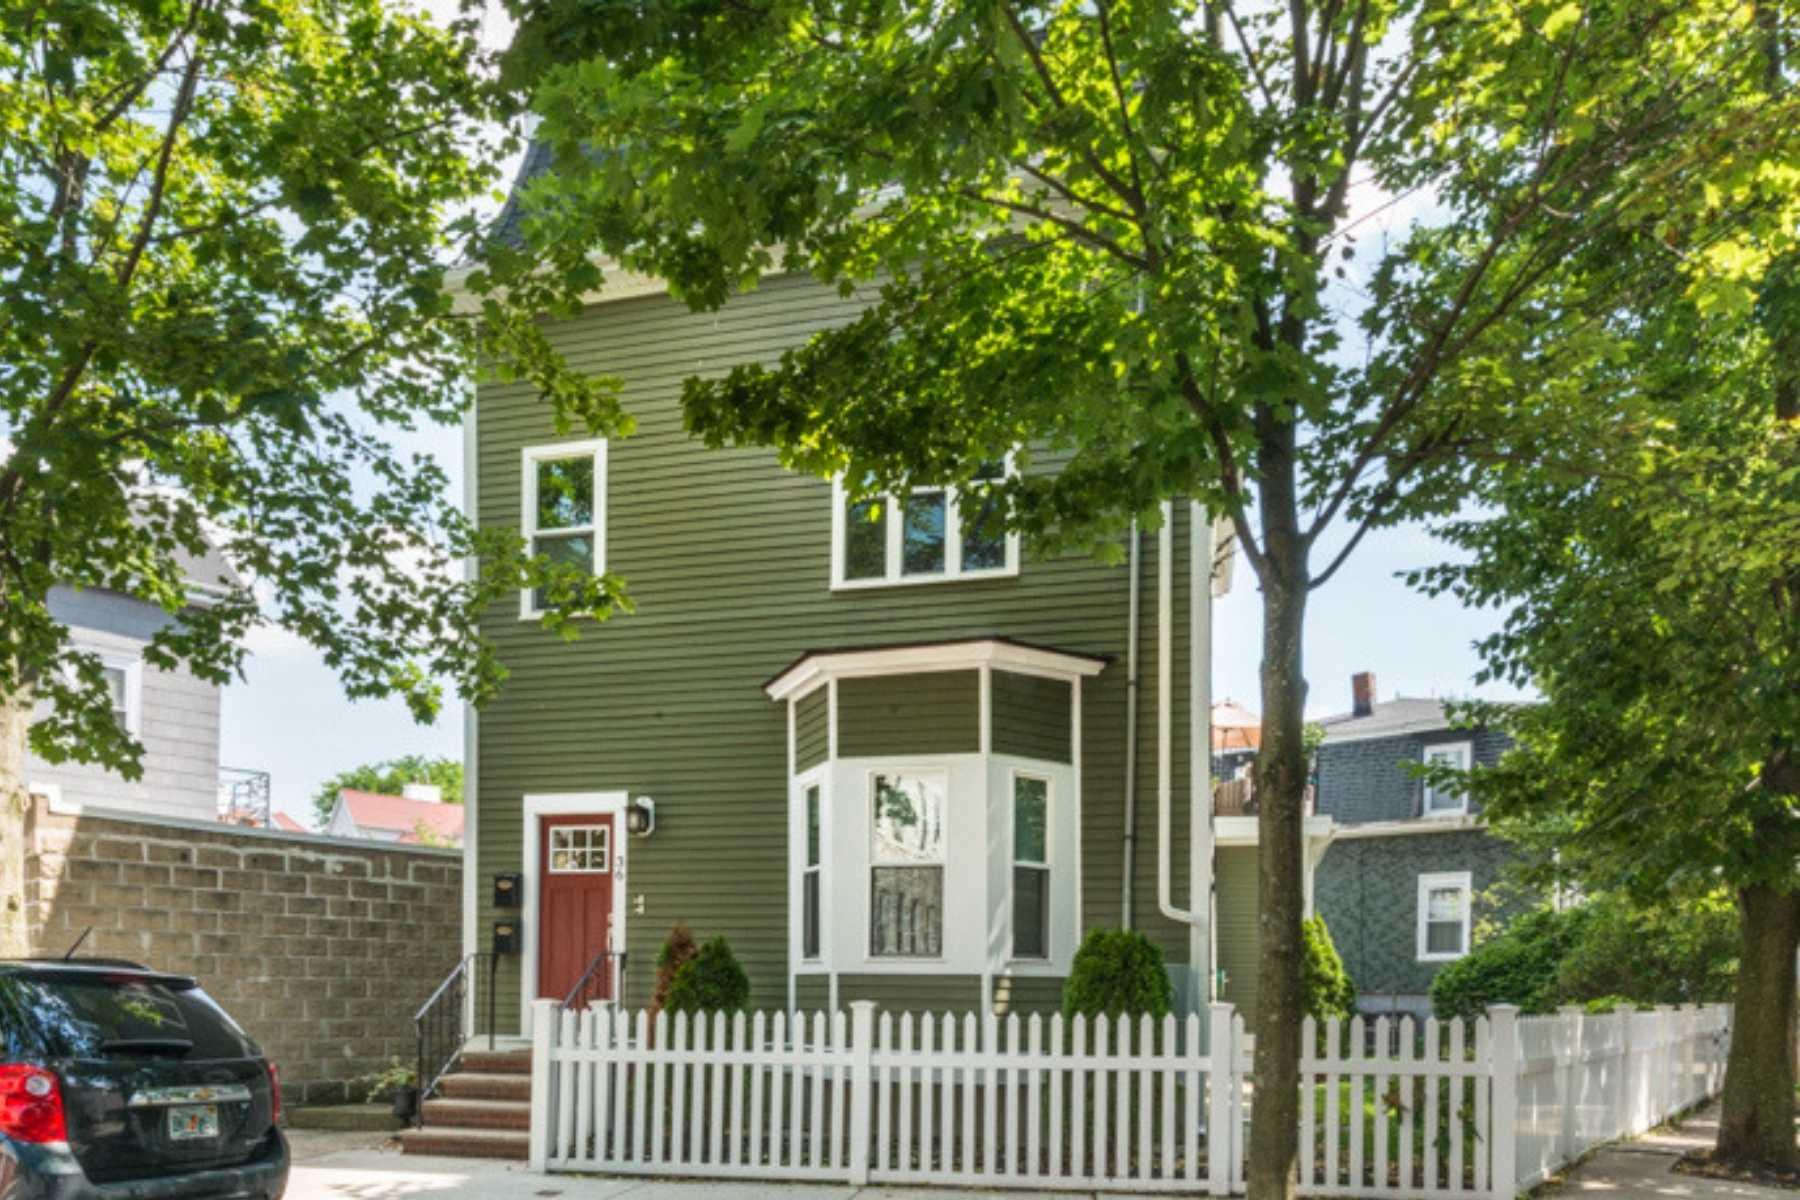 1-CapstoneCommunities-property-OakStreetCondominiums-Somerville.jpg